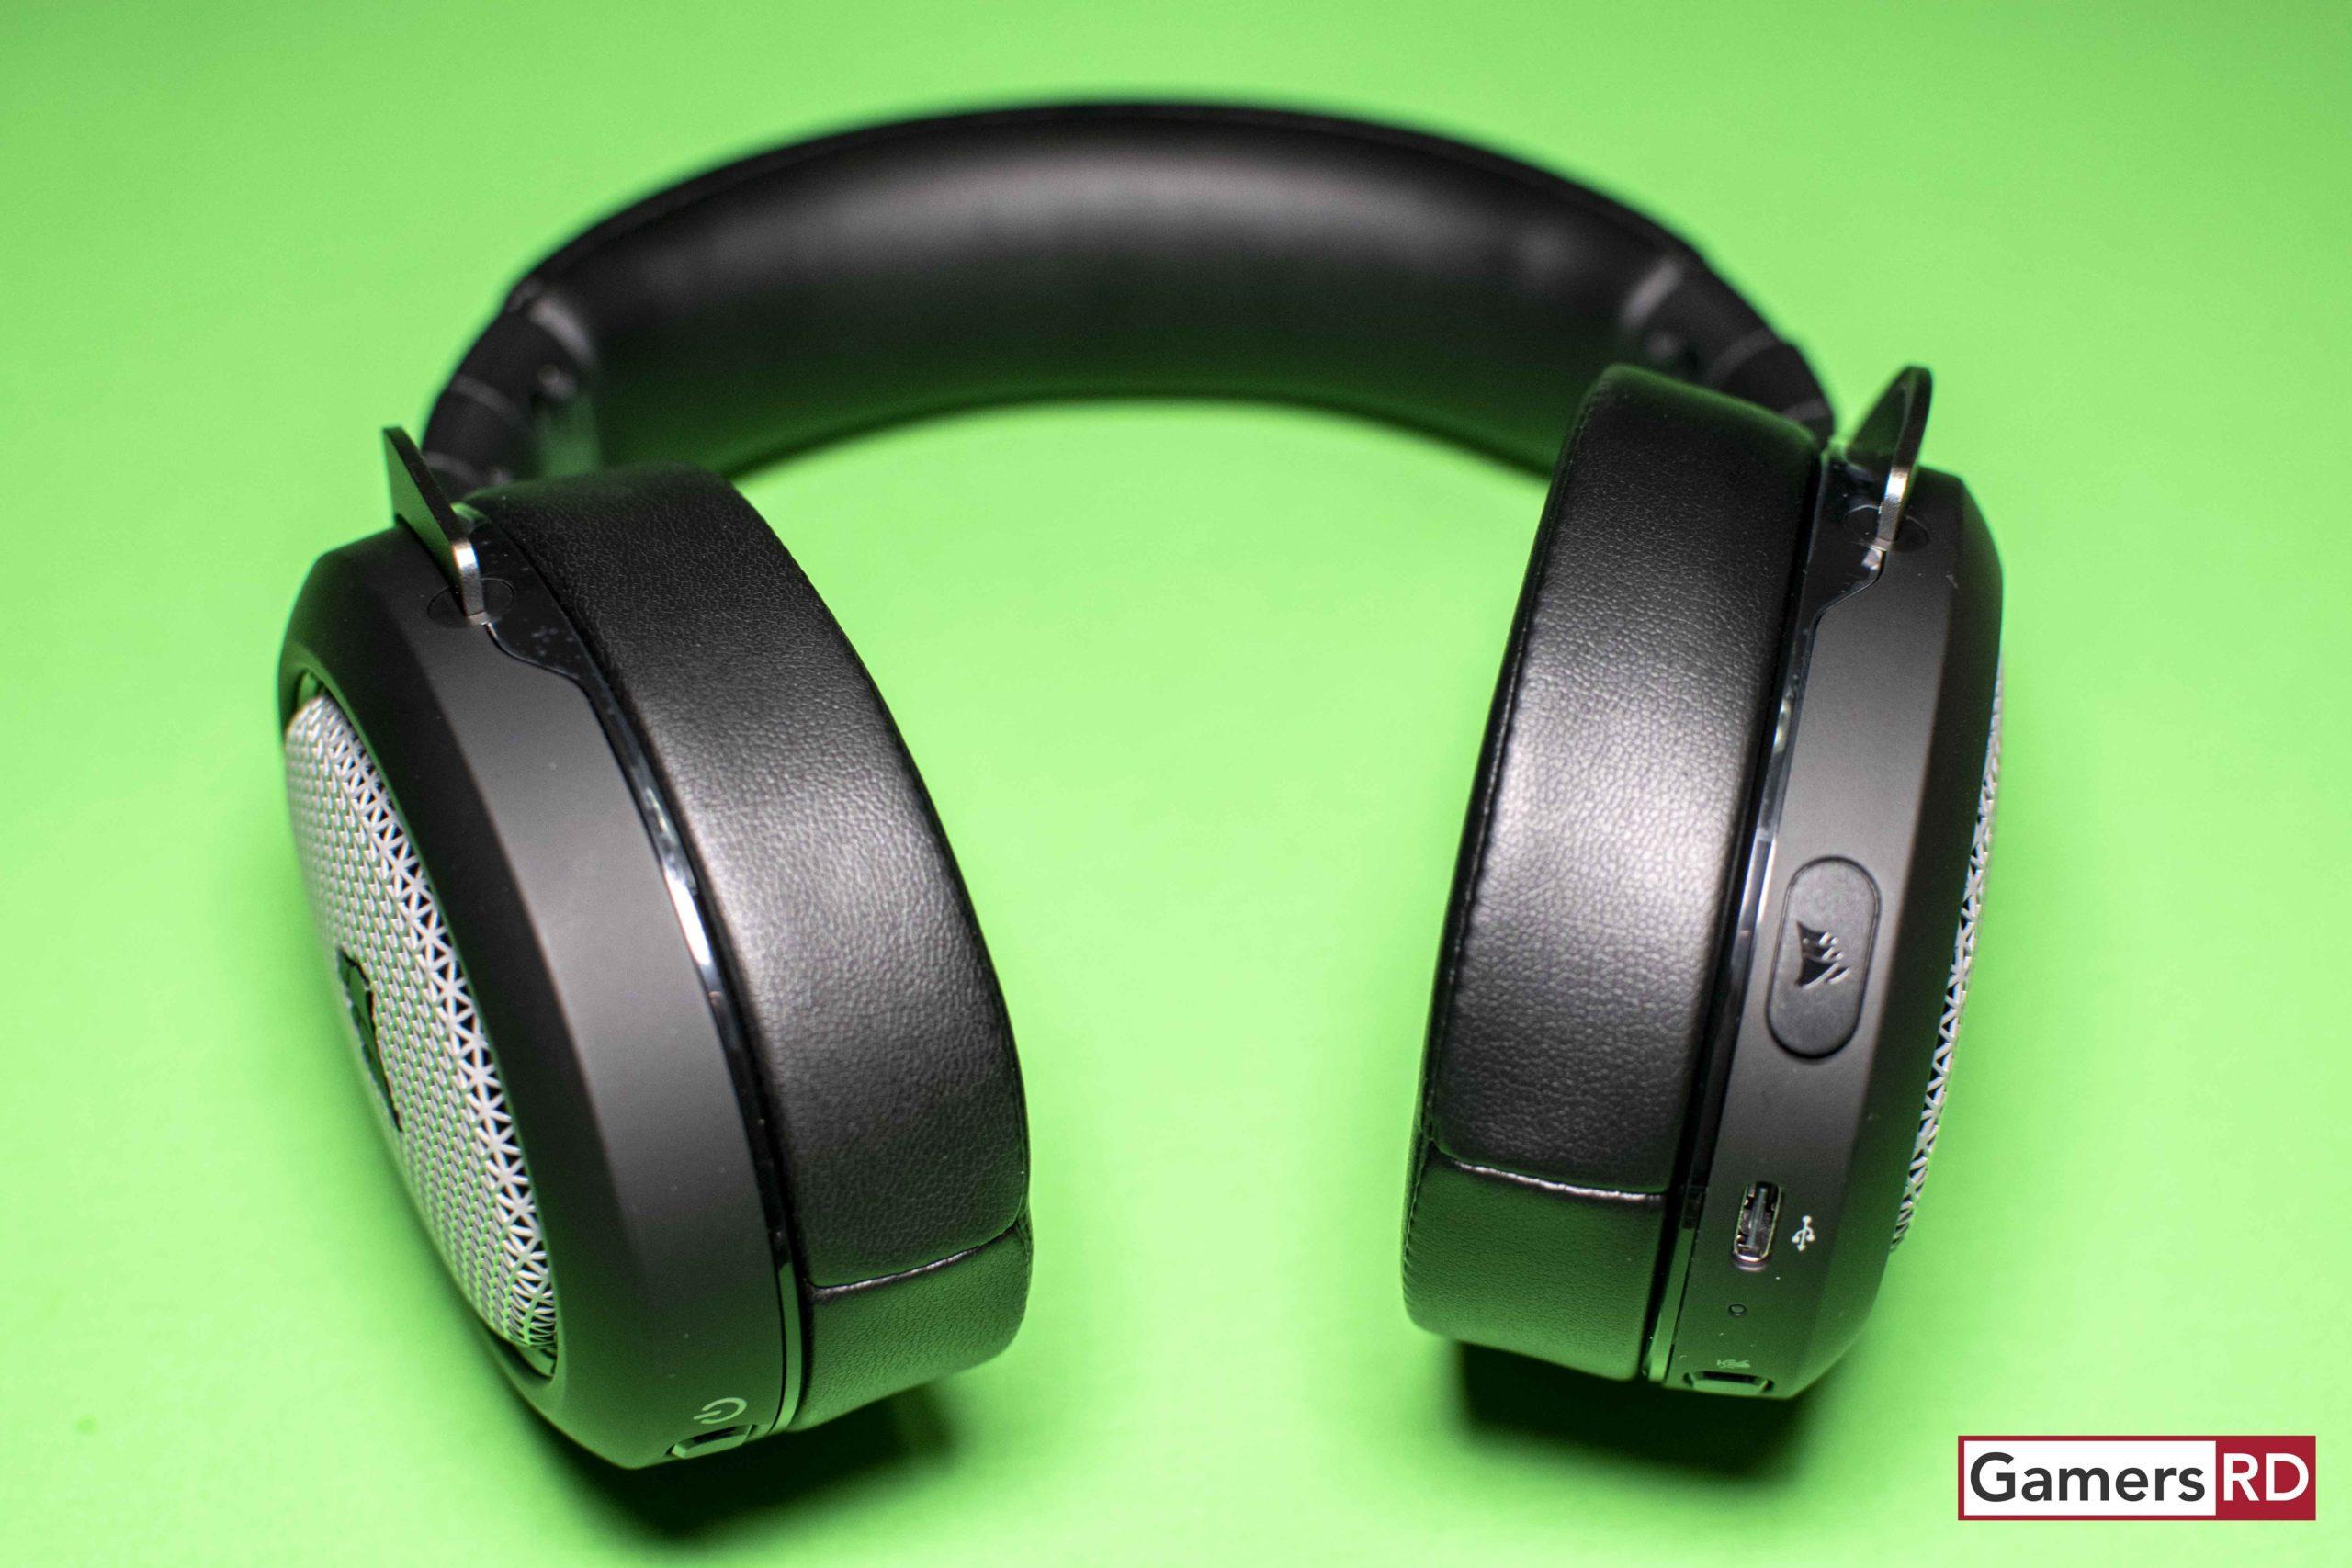 CORSAIR HS 75 XB Headset review, 5 GamersRD